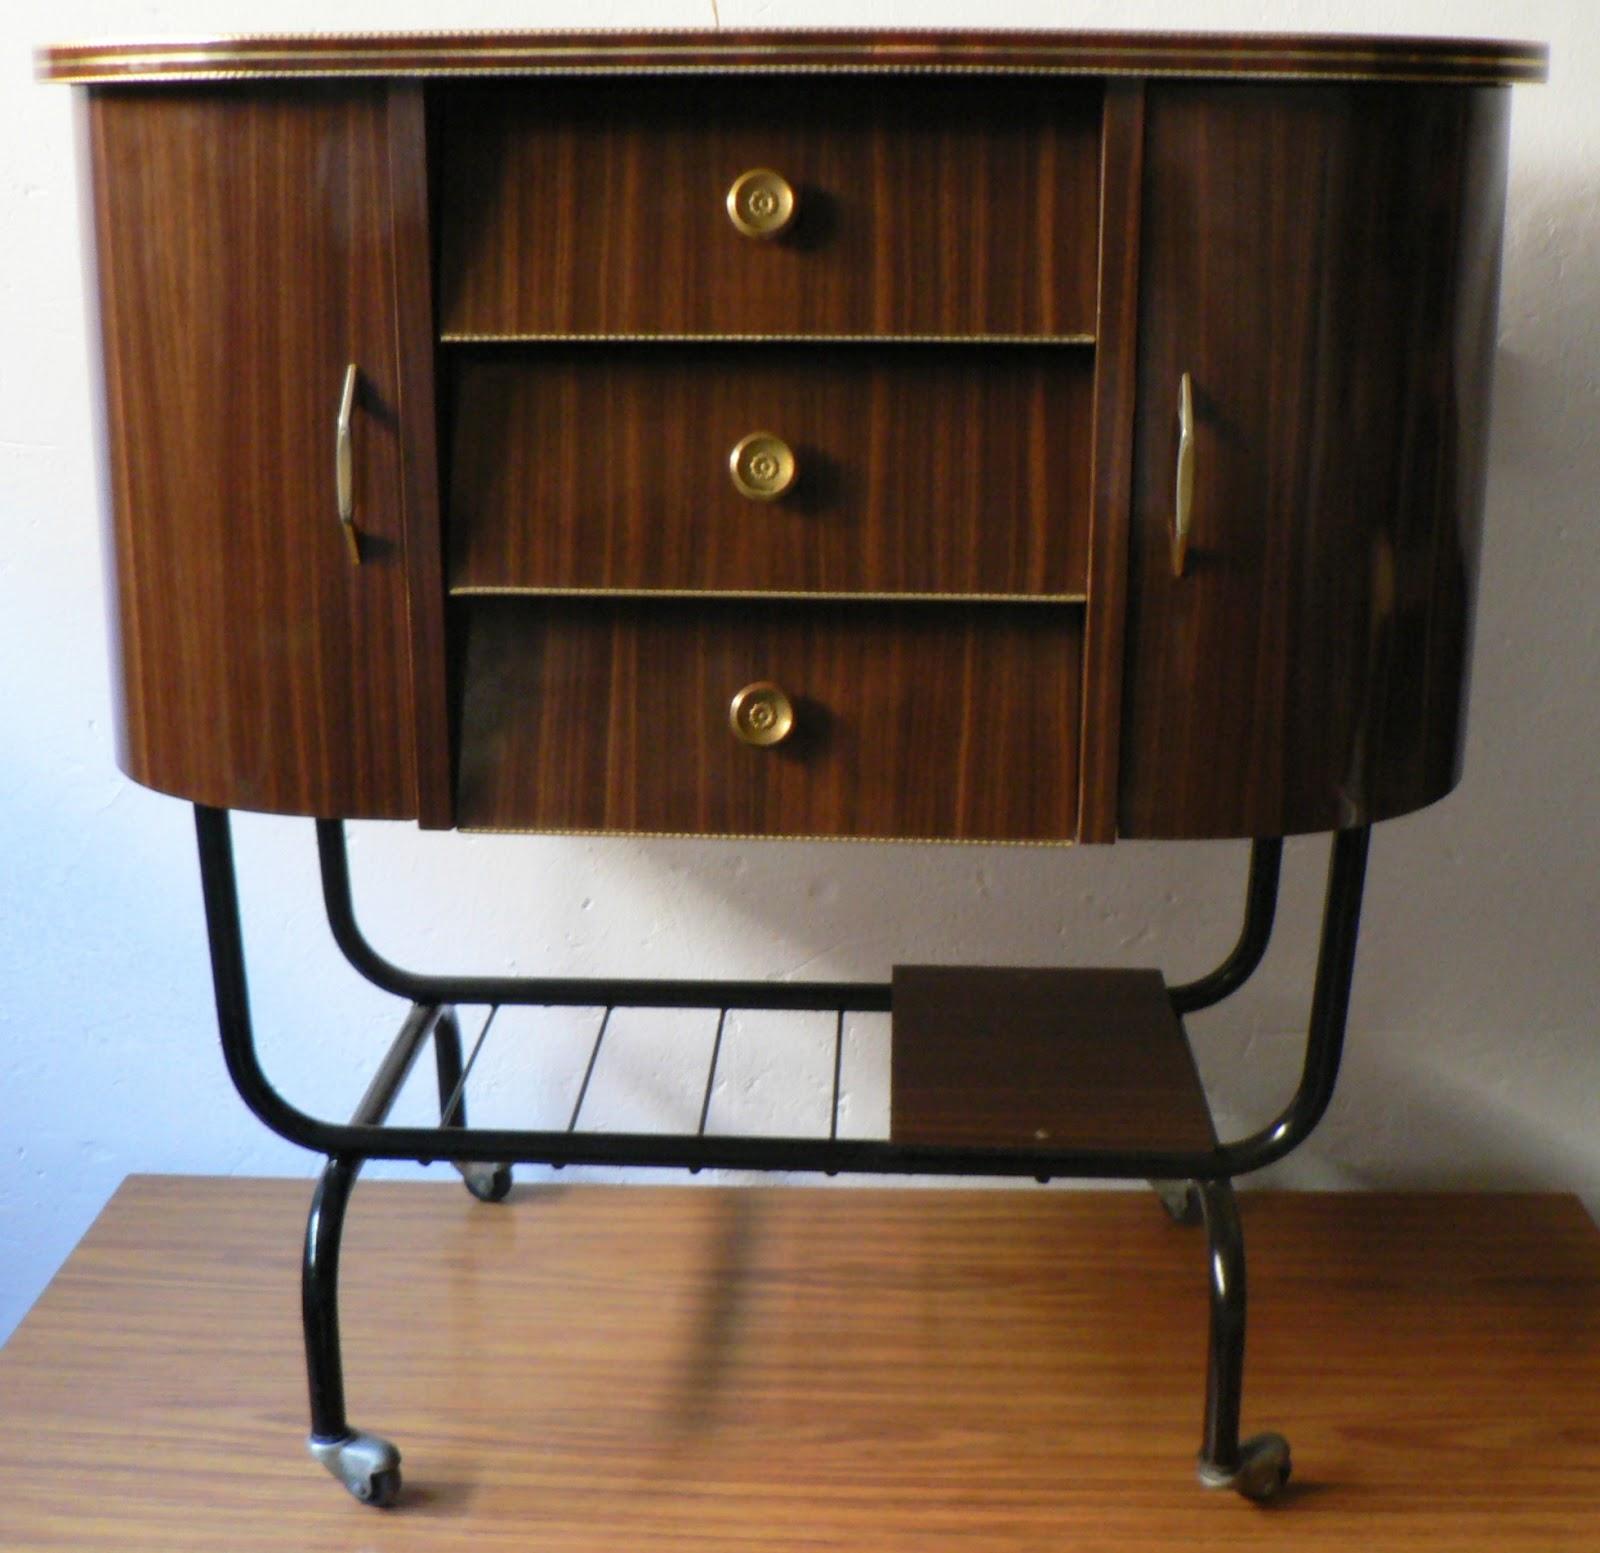 Muebles Daneses Anos 50 Dise Os Arquitect Nicos Mimasku Com # Rewind Muebles Vintage